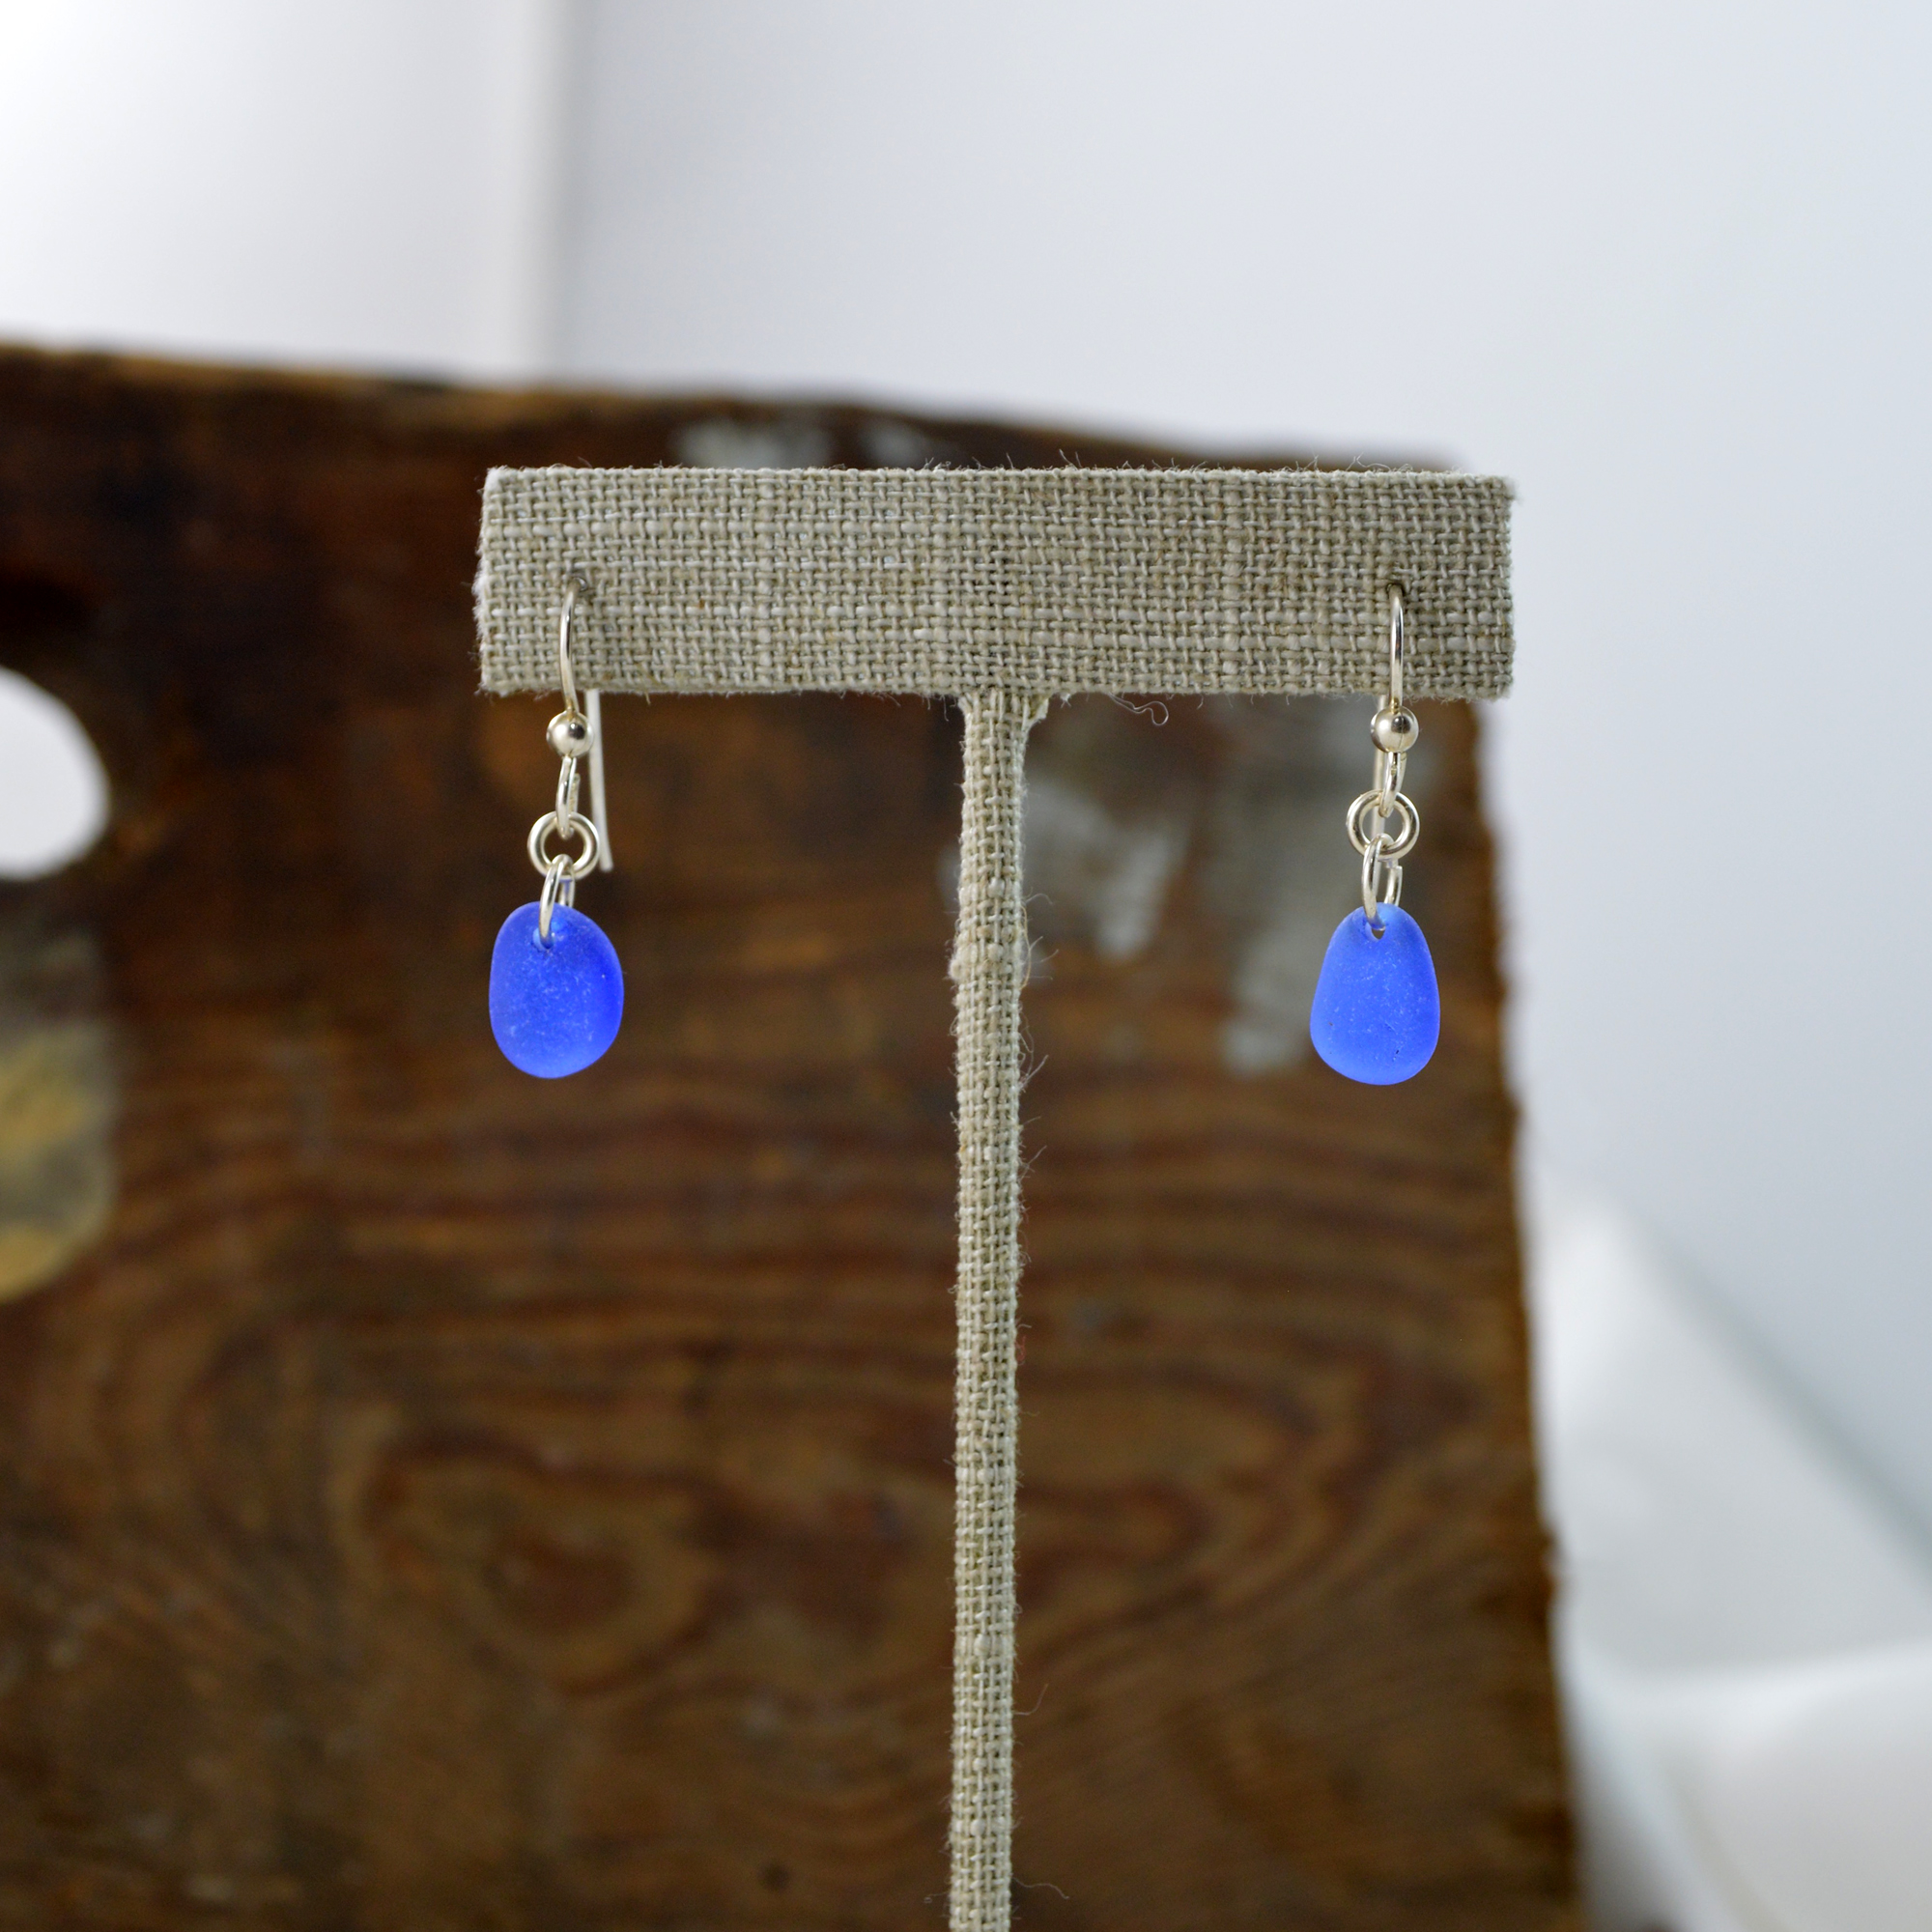 sea glass earrings made in buffalo ny gift shop